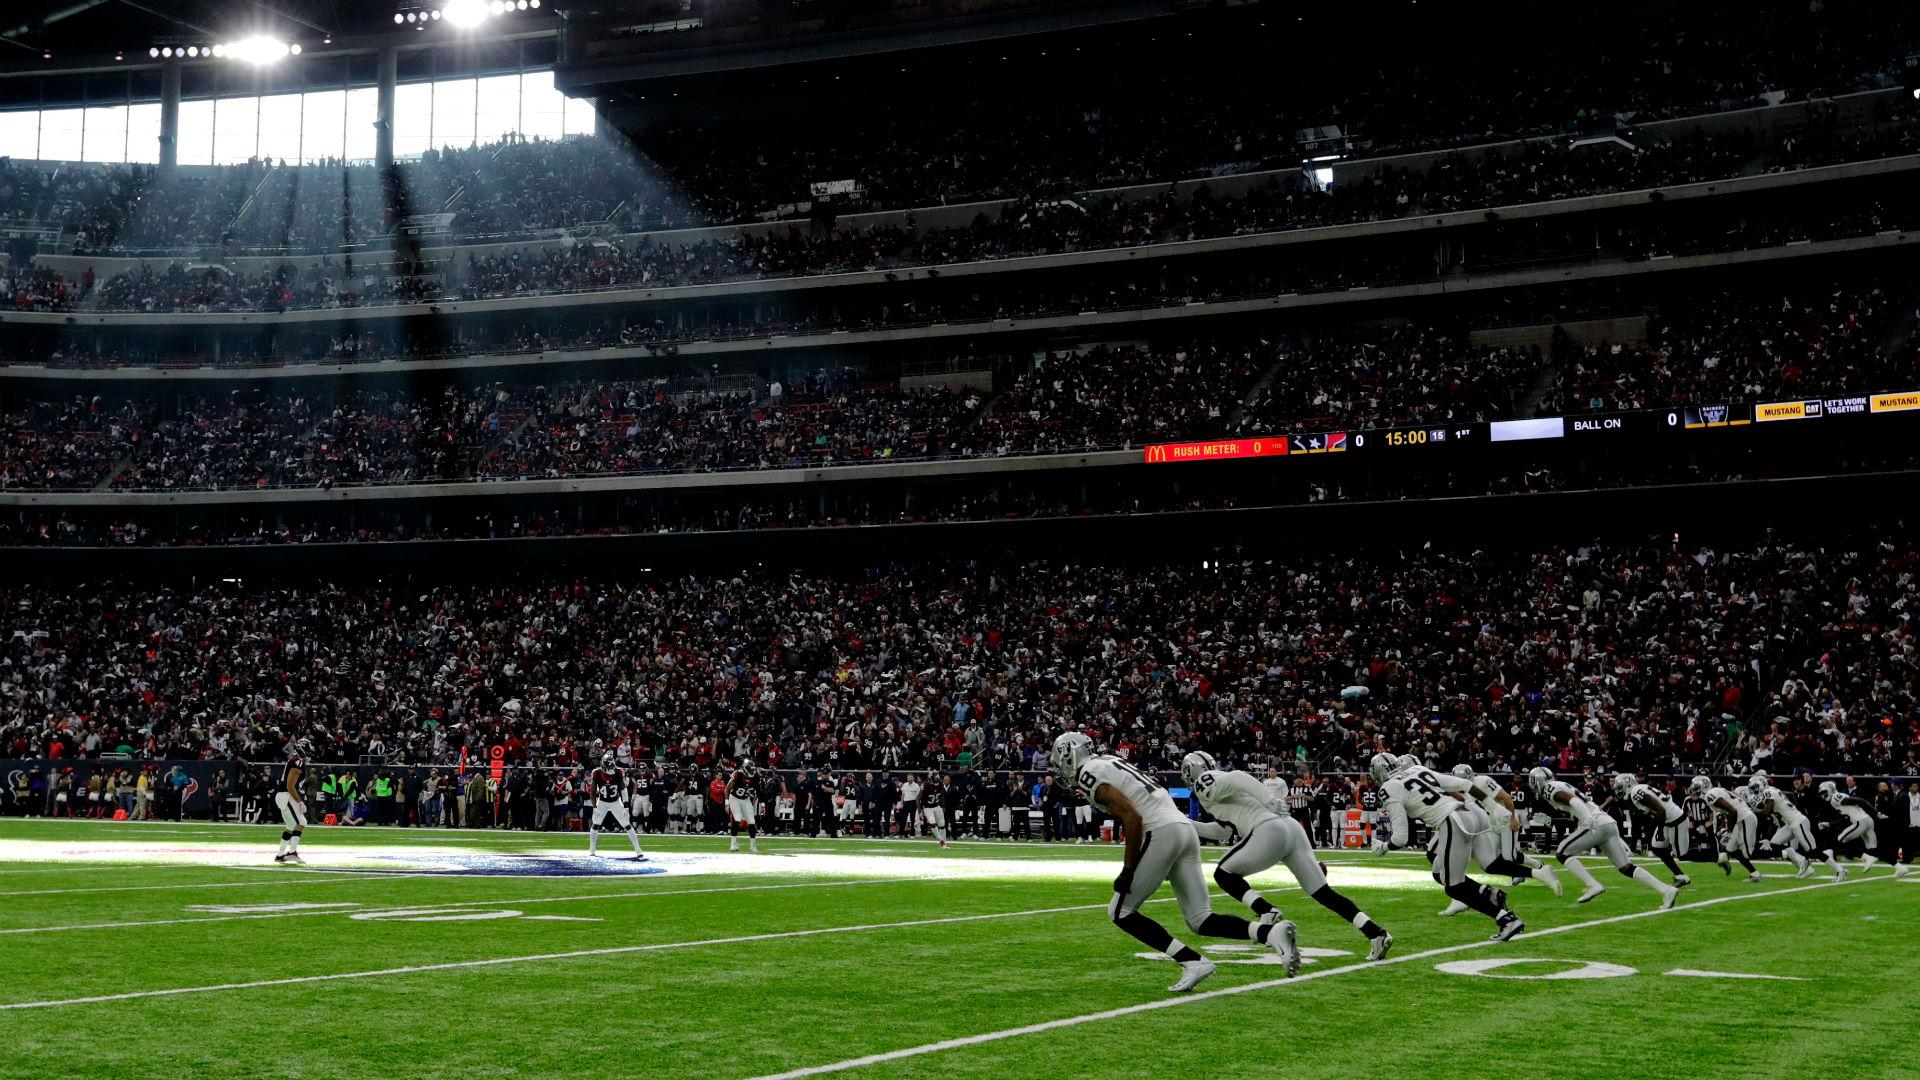 Raiders-kickoff-050318-getty-ftrjpg_1wfyxkr350rmz13d8sar9qwkfy